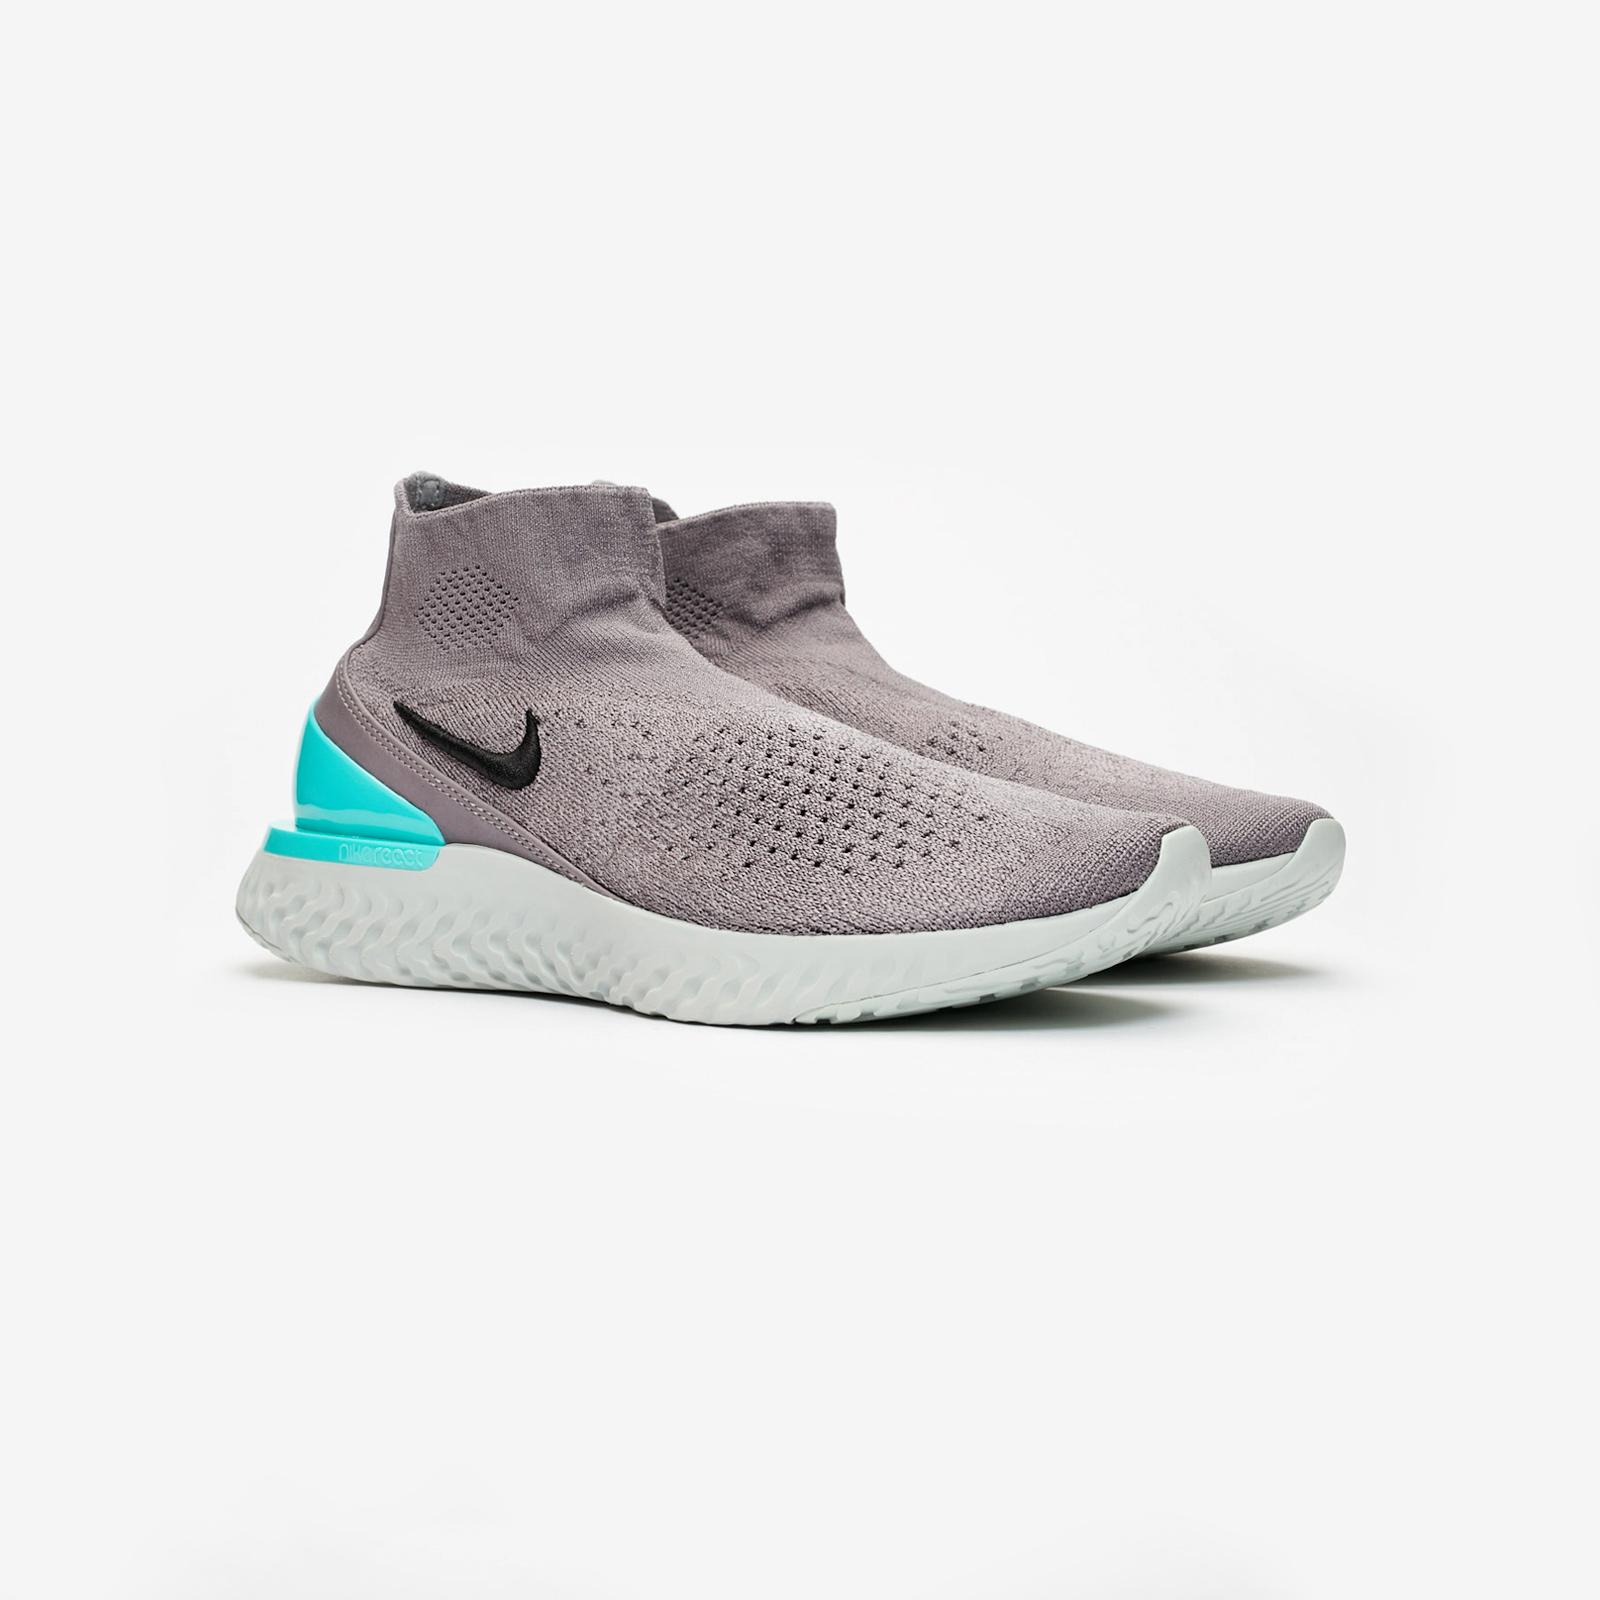 7c329606b7ef Nike Rise React Flyknit - Av5554-002 - Sneakersnstuff